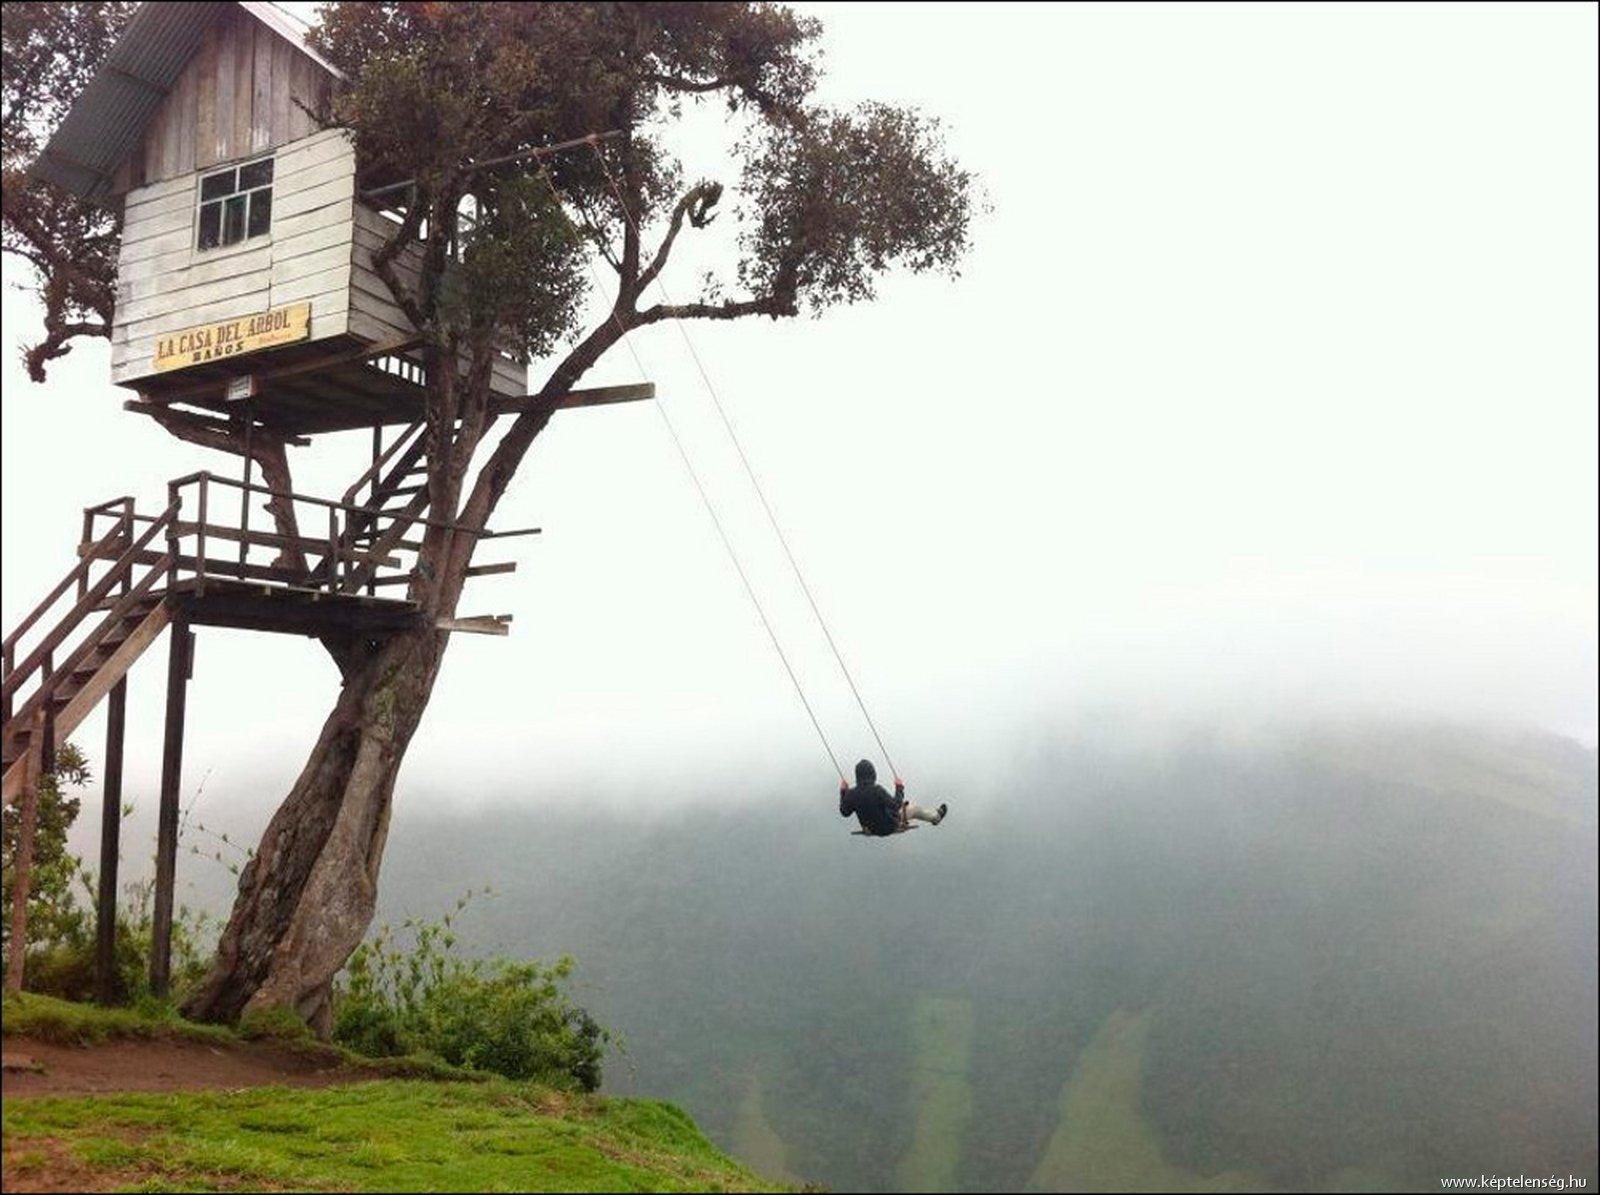 Epid-Treehouse